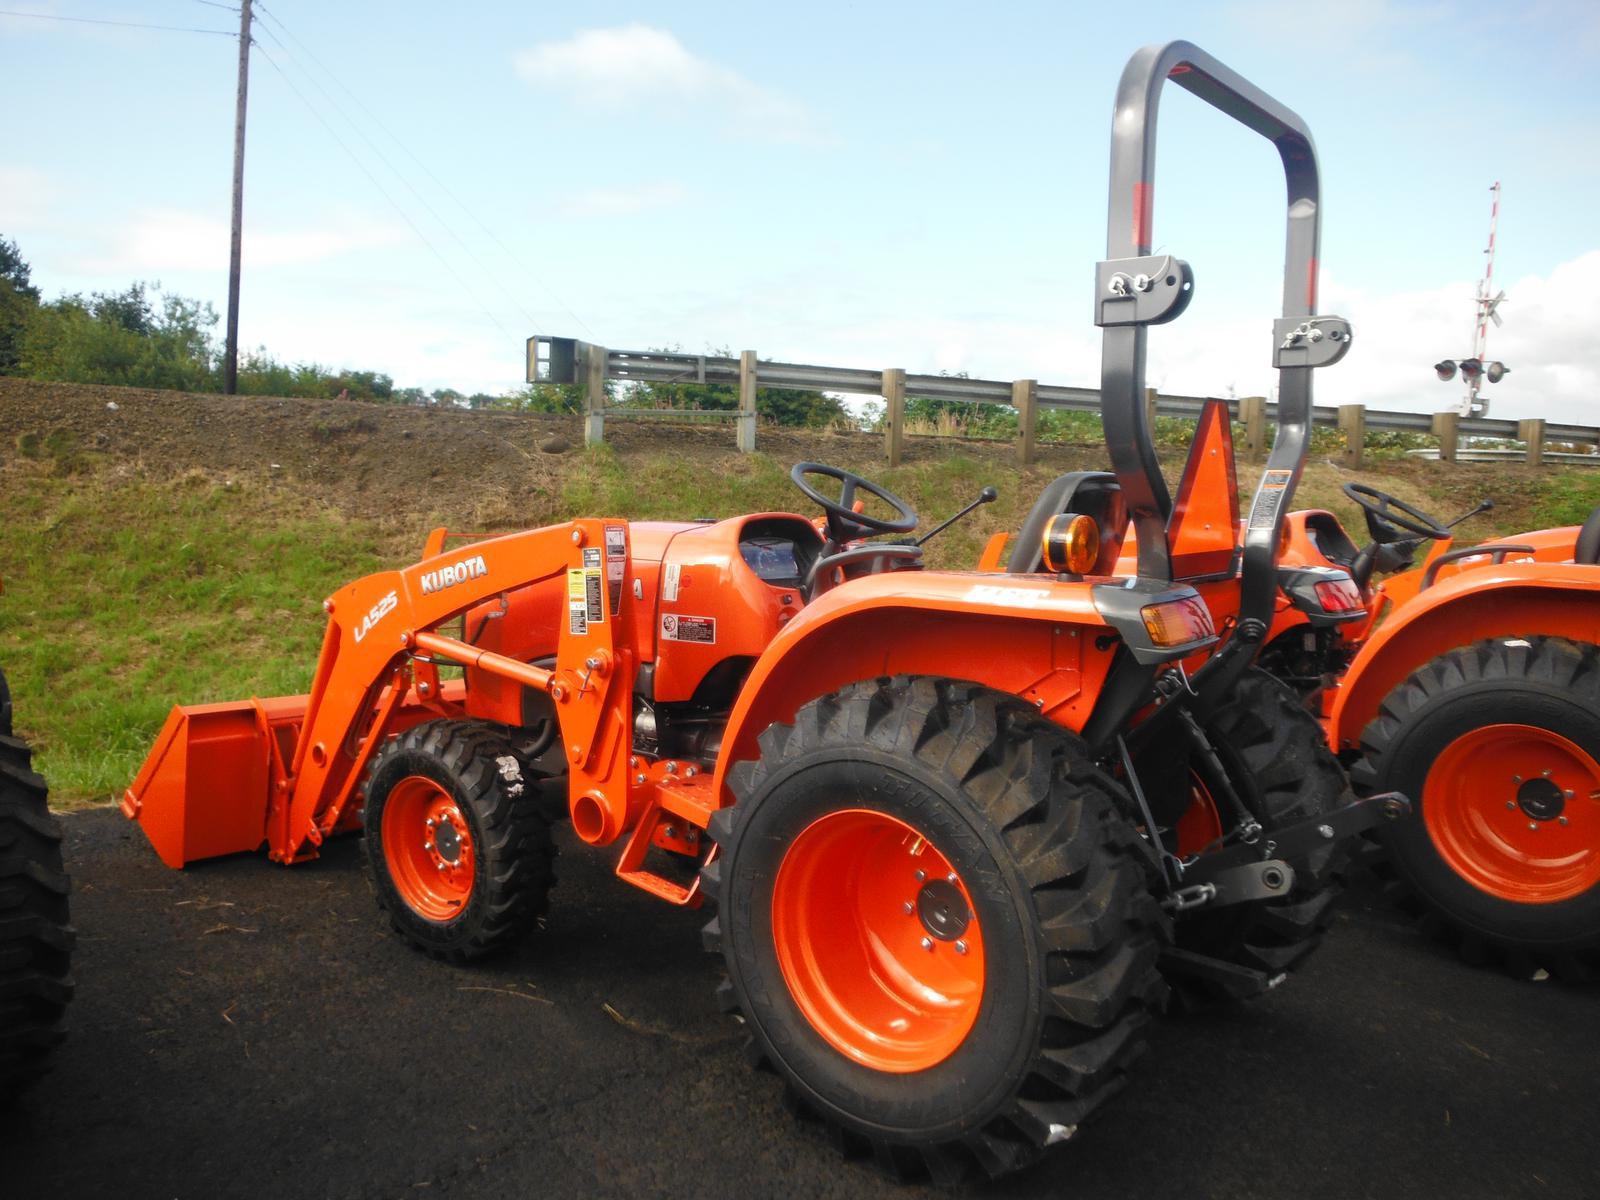 Kubota L2501 Hst For In Tillamook Or Boyd S Implement Service Llc 877 842 9408